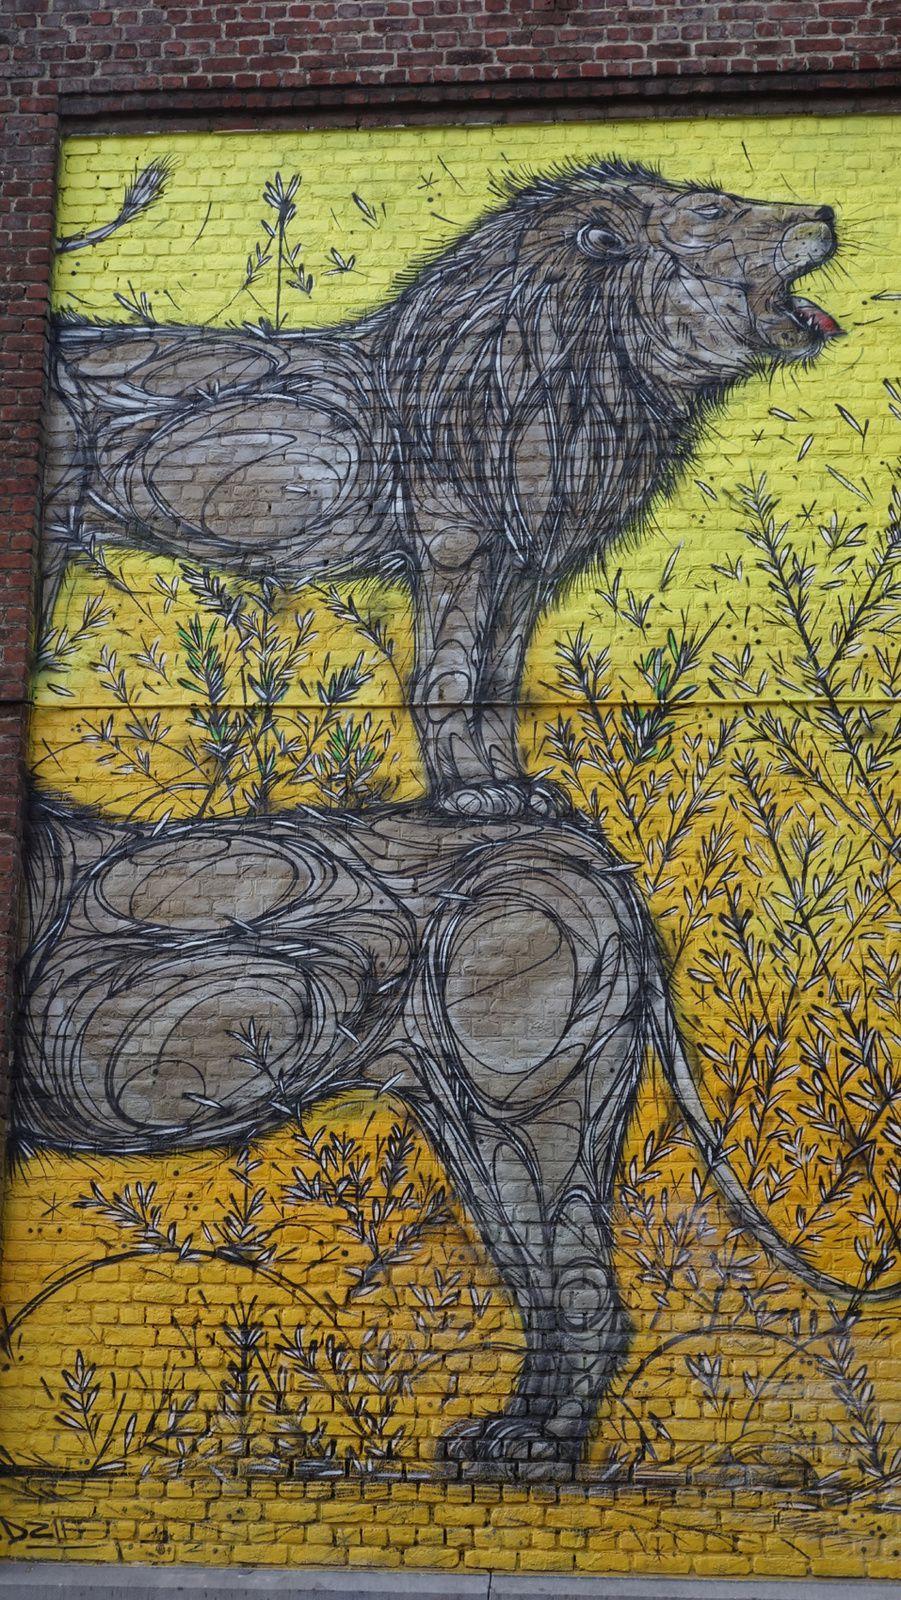 Street Art : Graffitis & Fresques Murales 1050 Bruxelles ( Belgique )